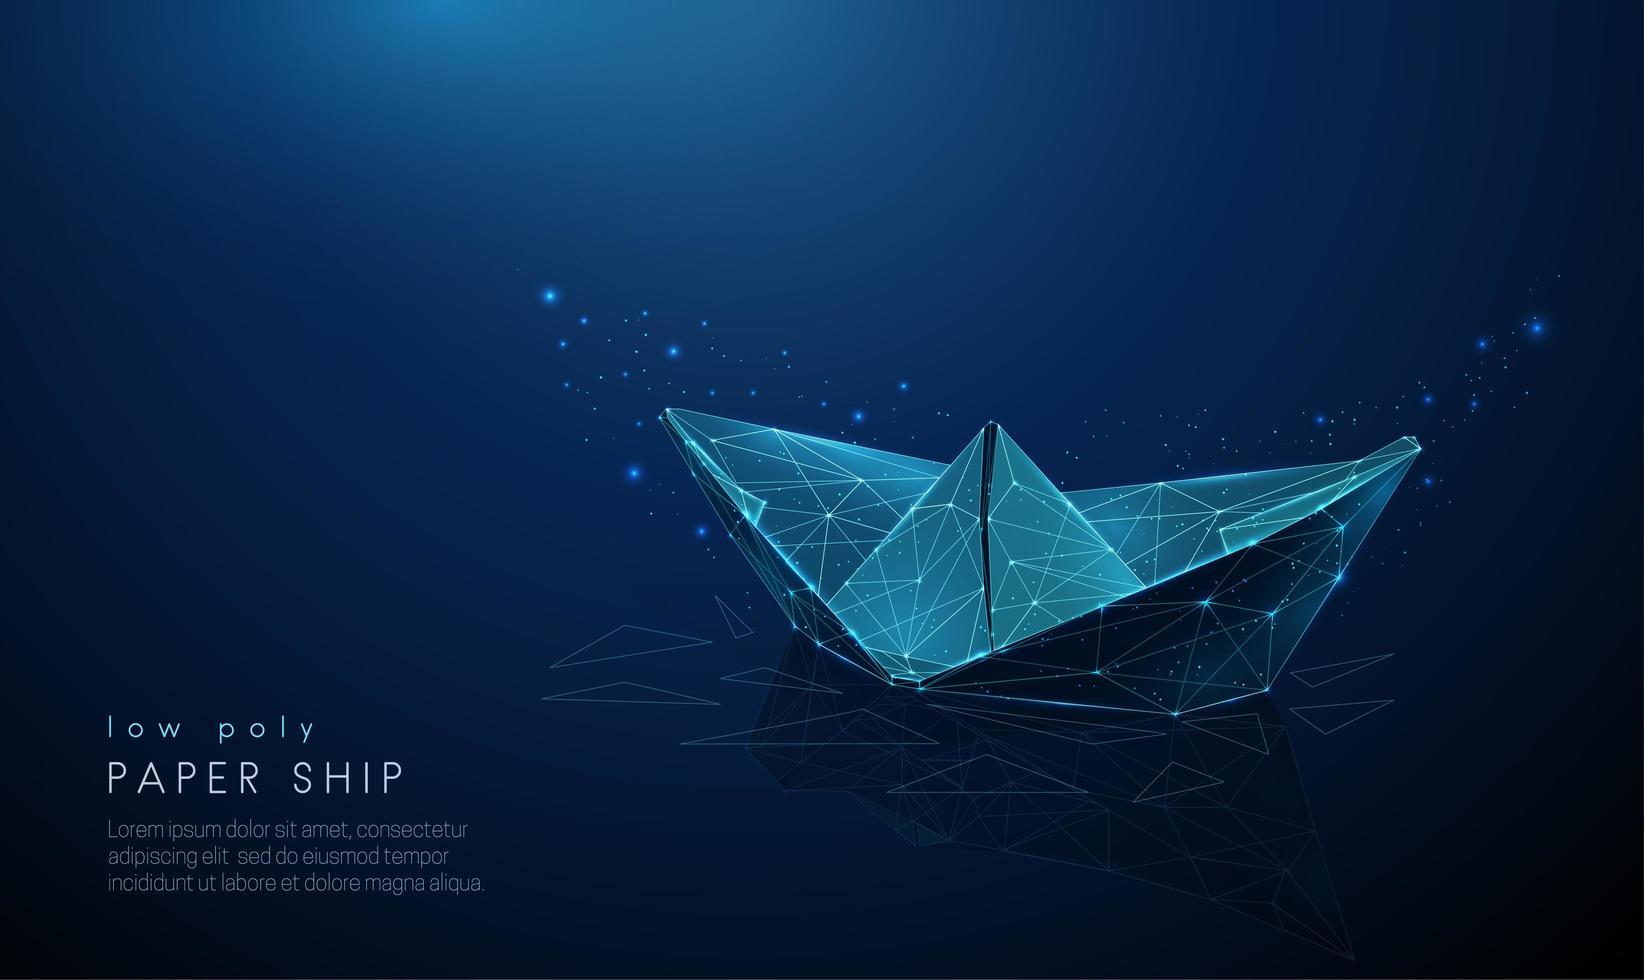 abstraktes Papierschiff. Low Poly Style Design. vektor